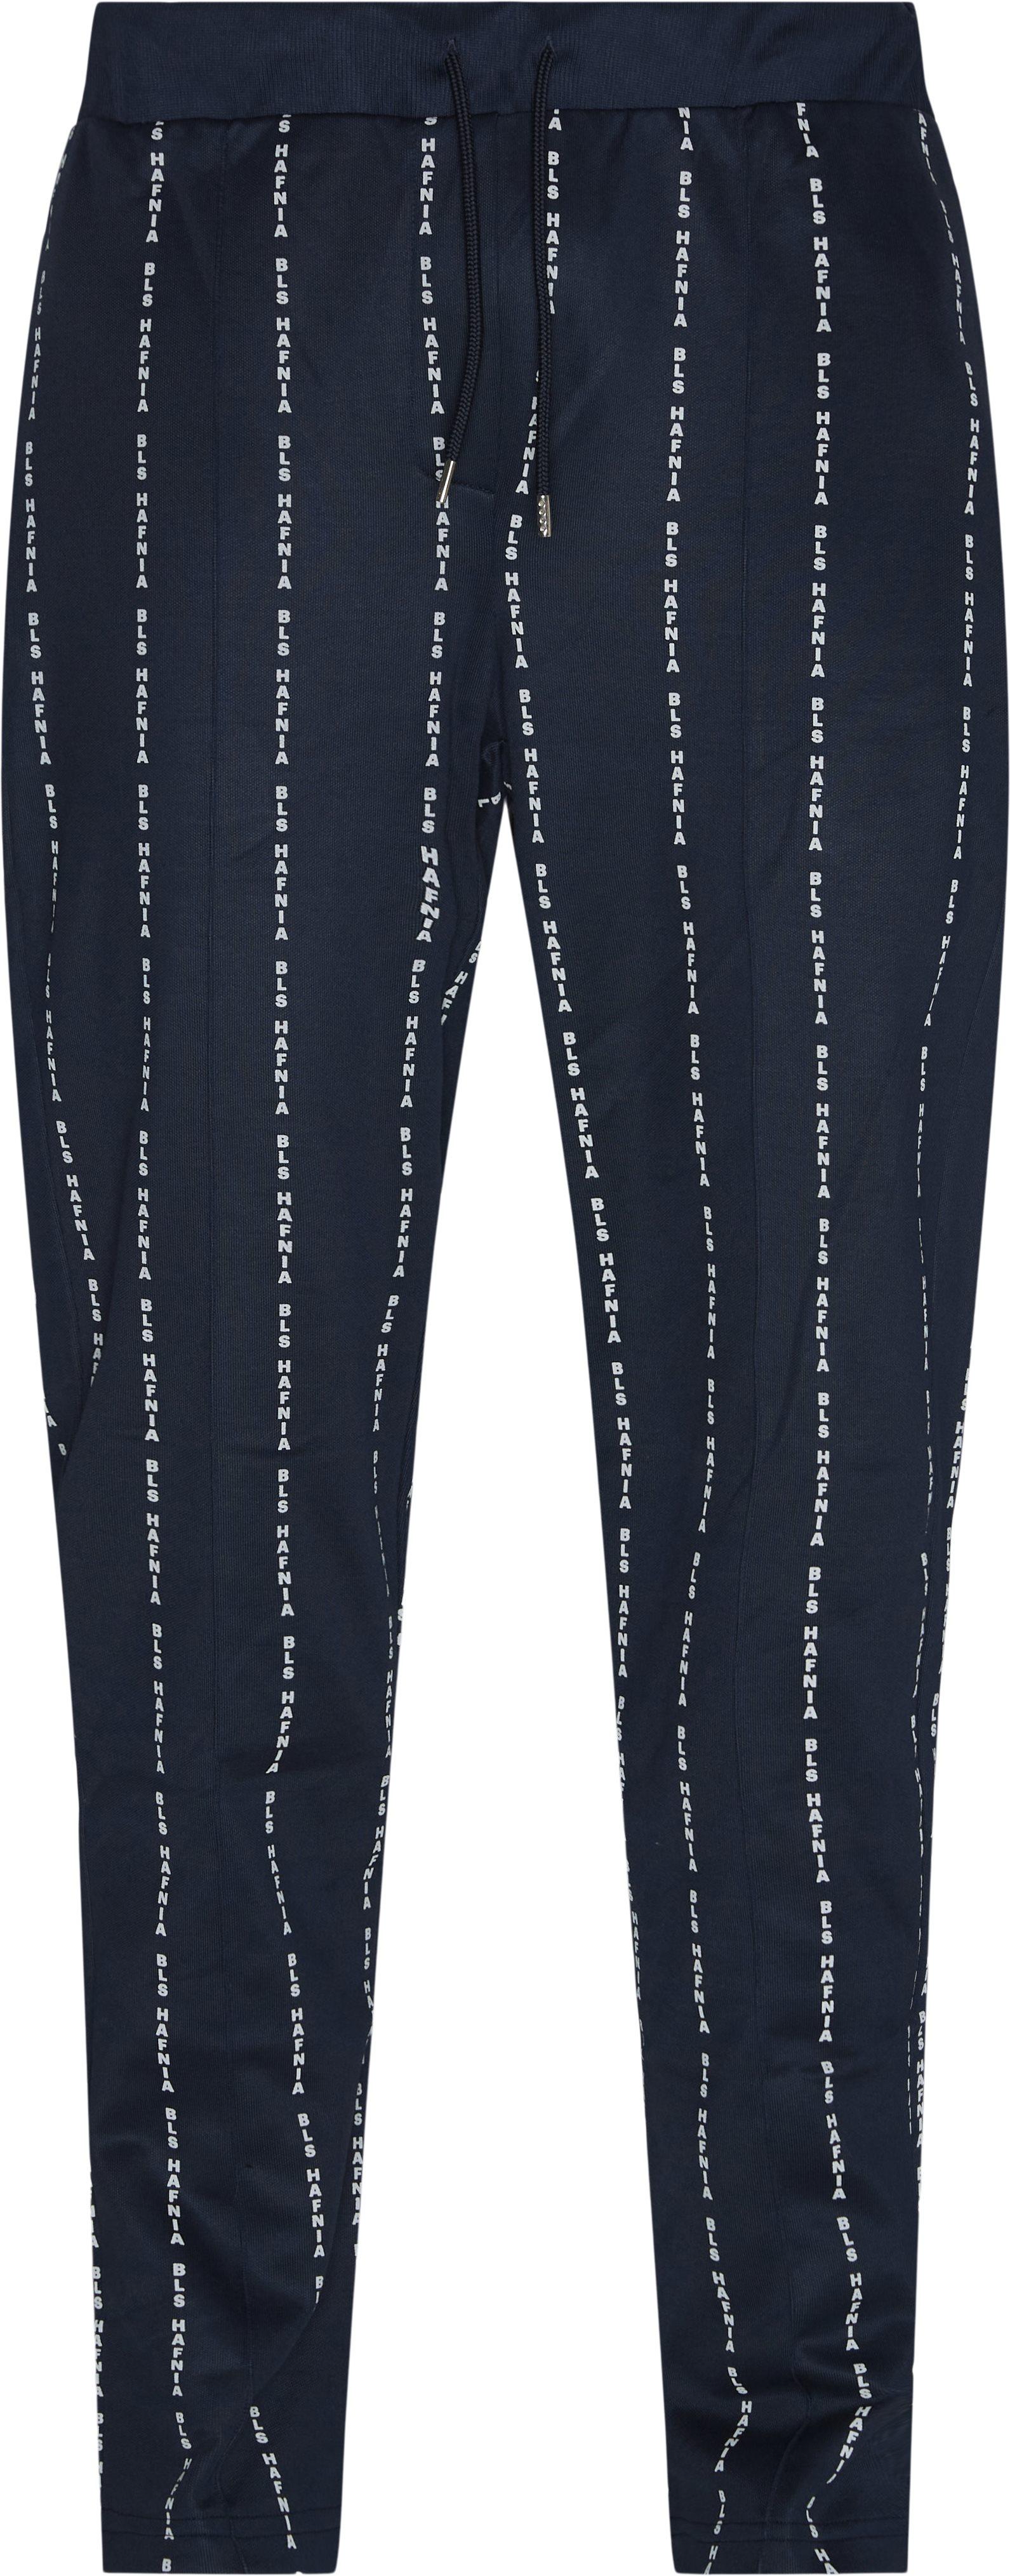 Trousers - Regular fit - Blue